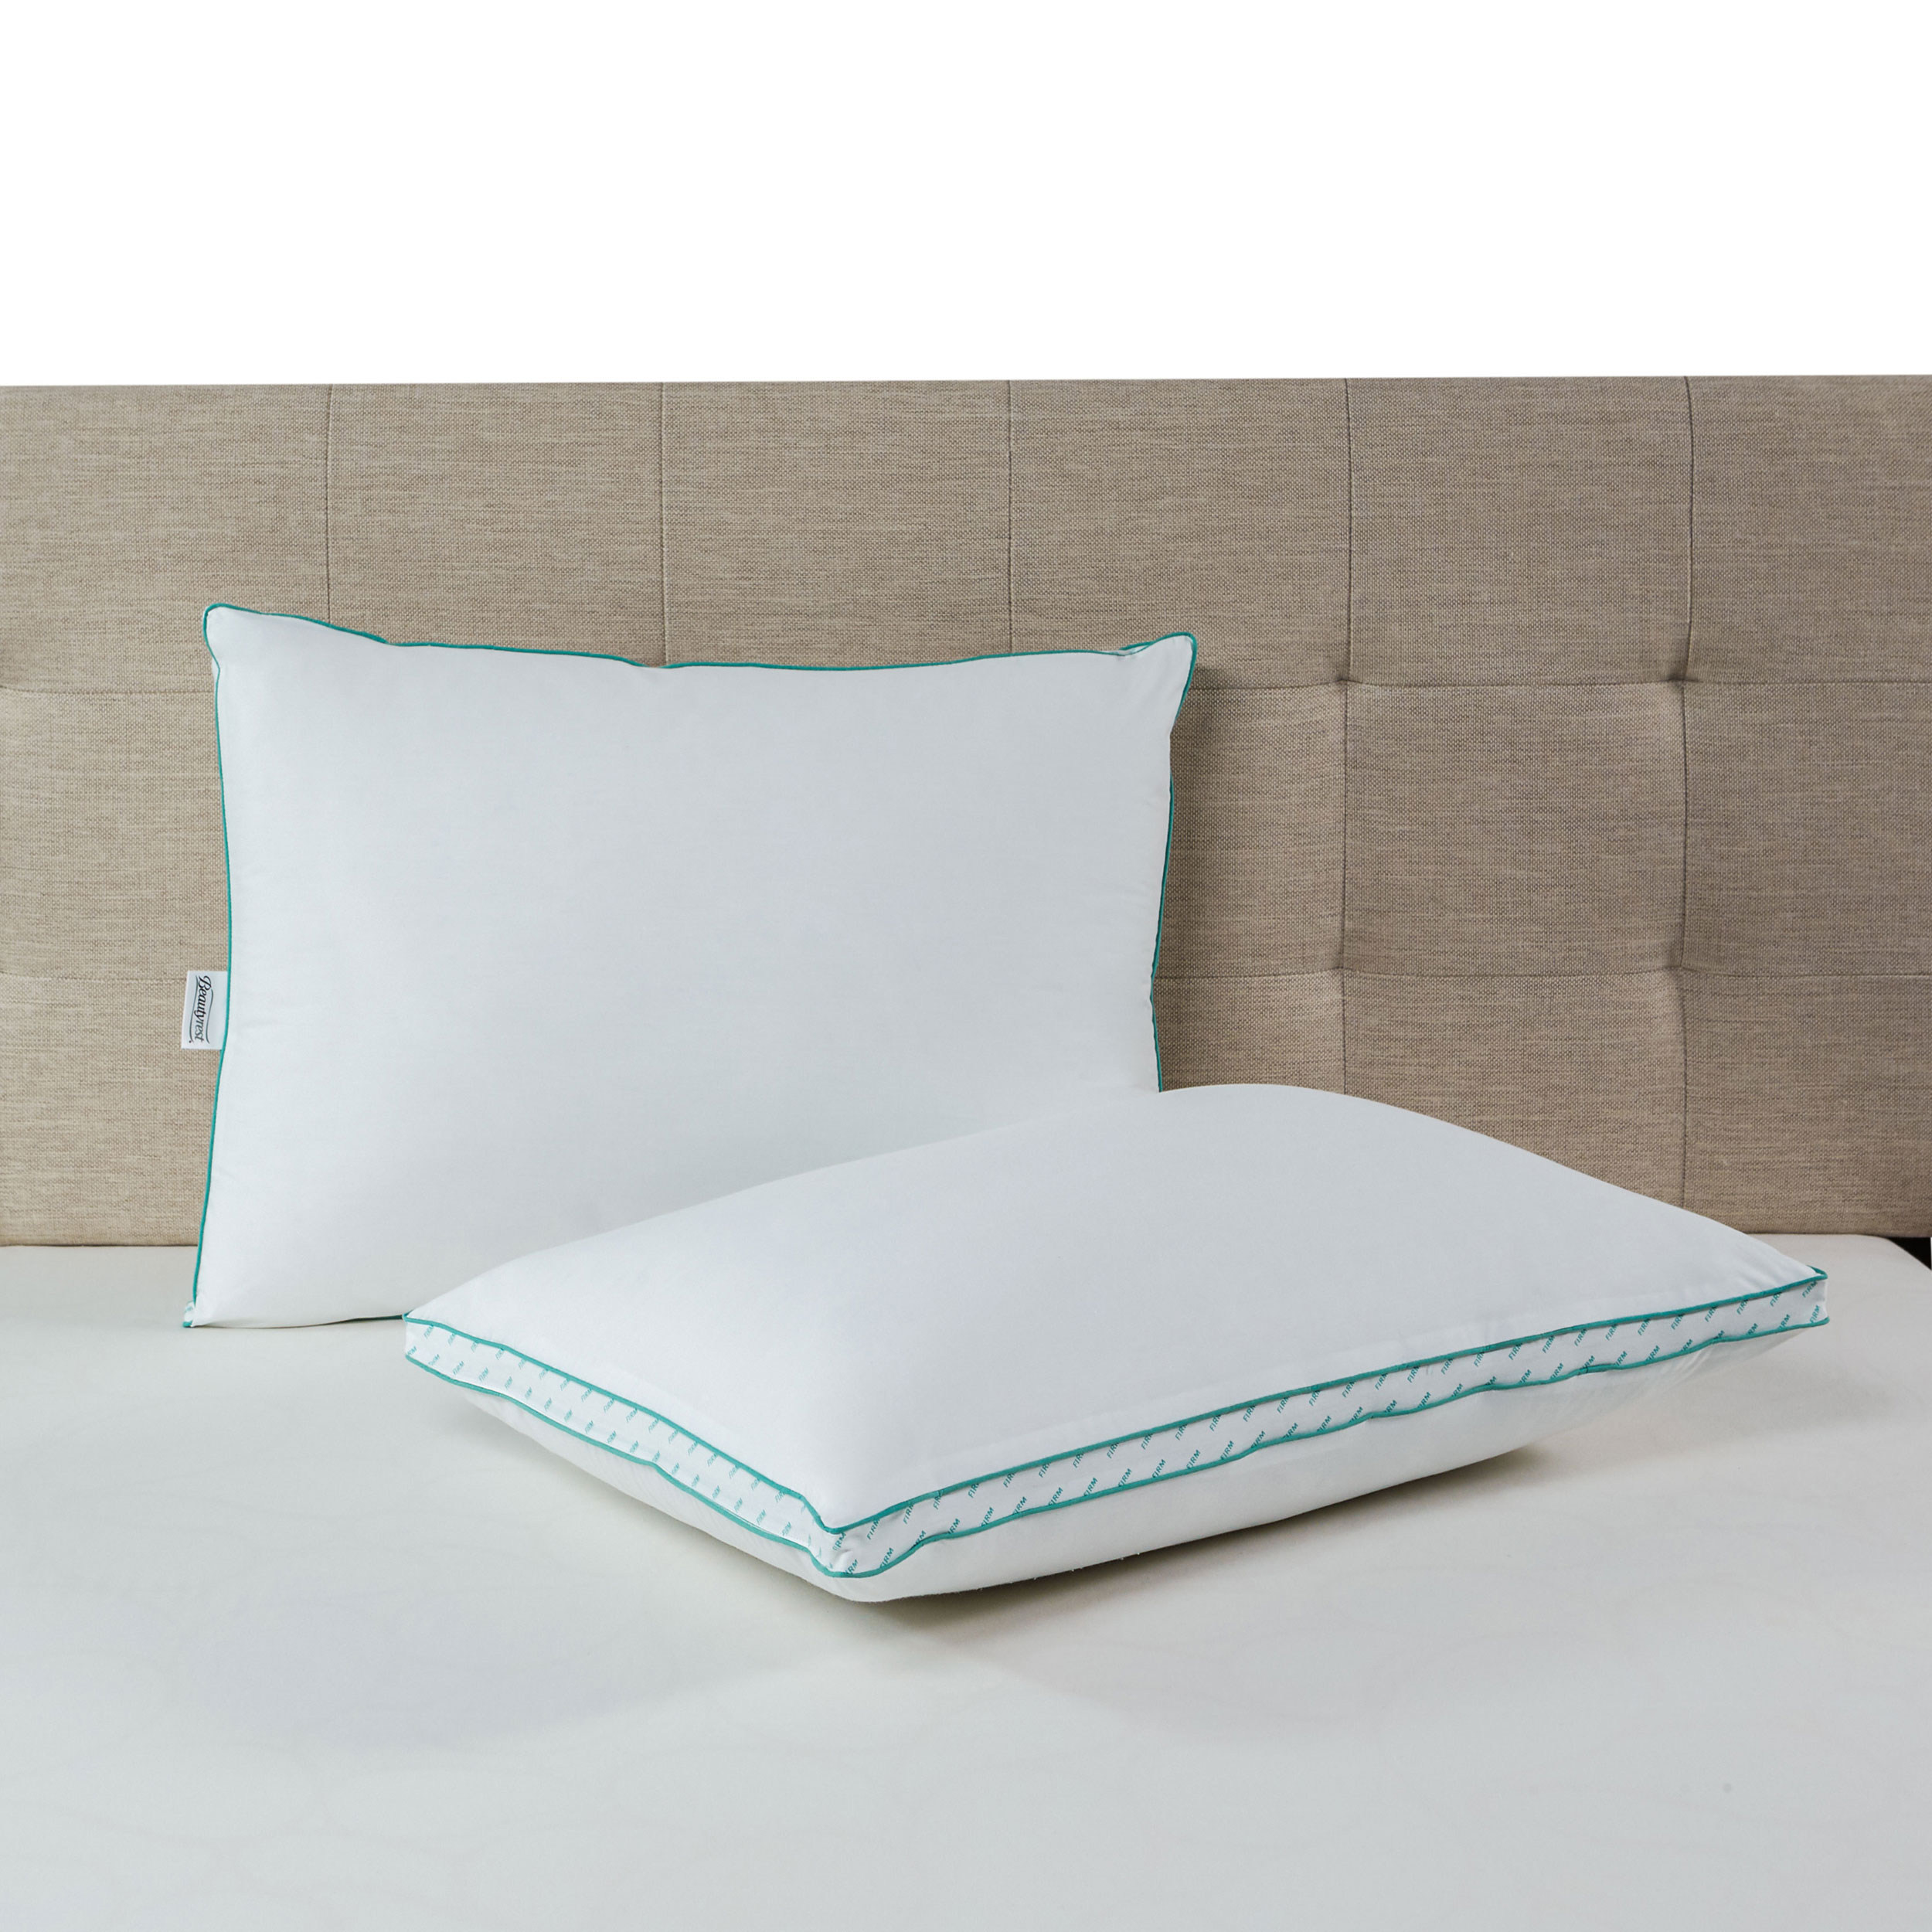 beauty rest pillows matres image